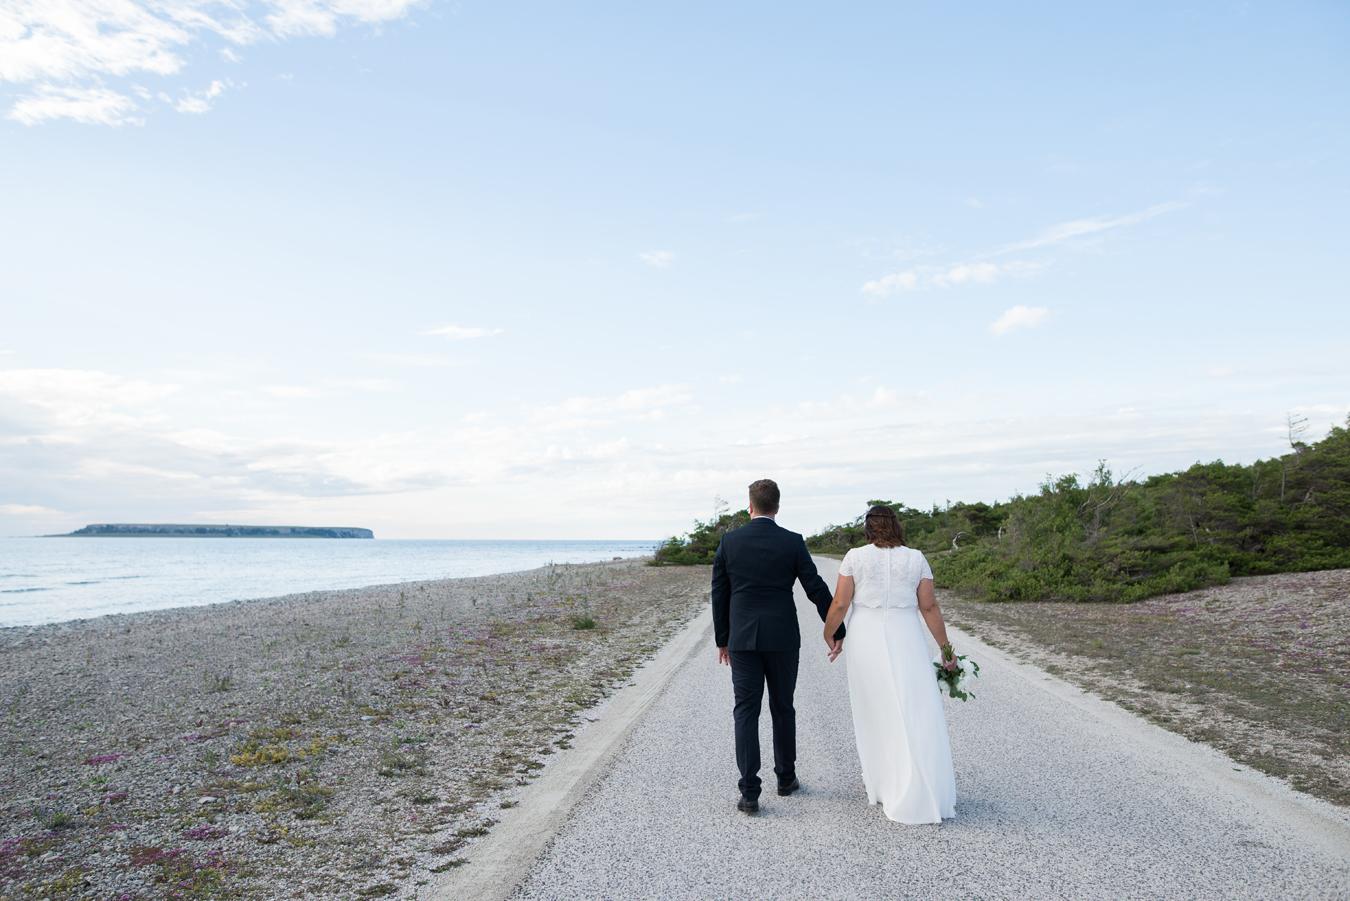 094-bröllopsfotograf-gotland-ekstakusten-neas-fotografi.jpg